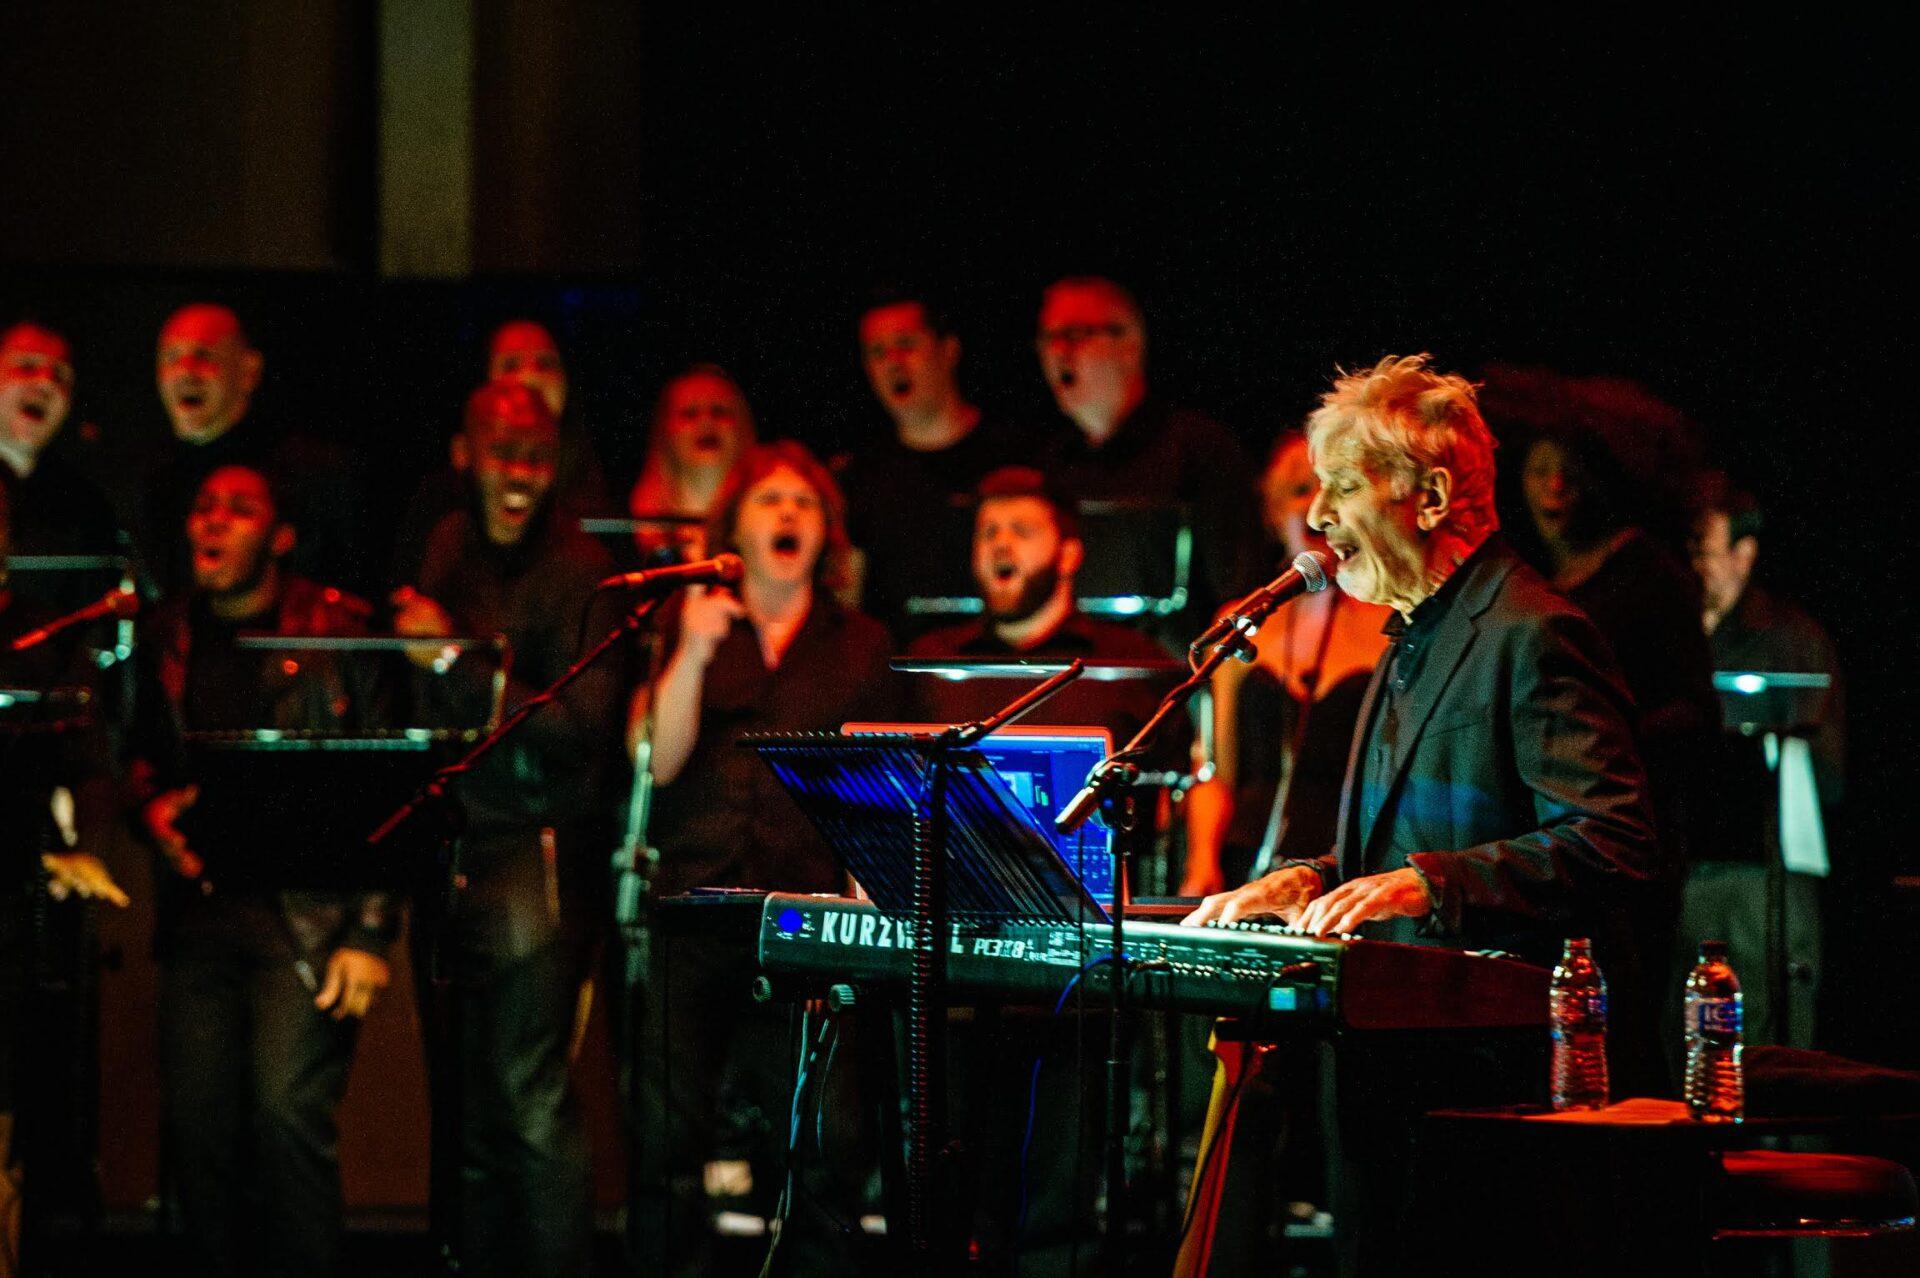 John Cale, Festival of Voice – St David's Hall, Cardiff, 04/06/16